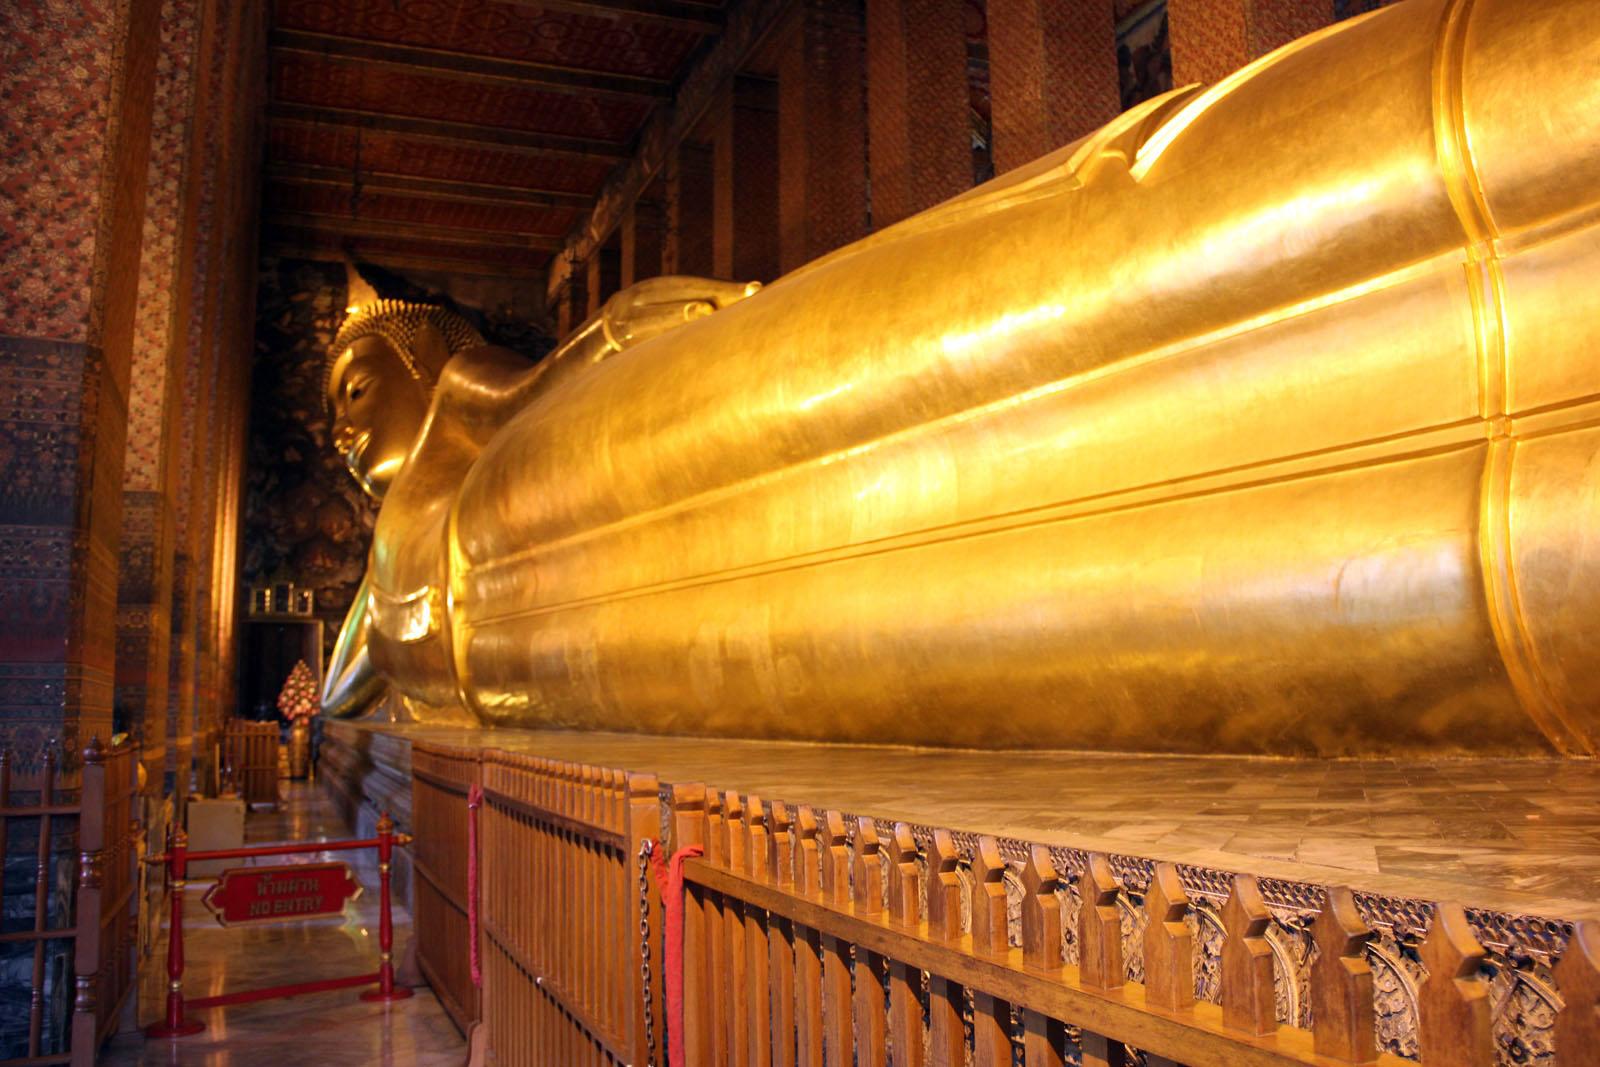 The Reclining Buddha in Bangkok (Thailand) & Wat Pho Temple of Reclining Buddha - Thailand islam-shia.org